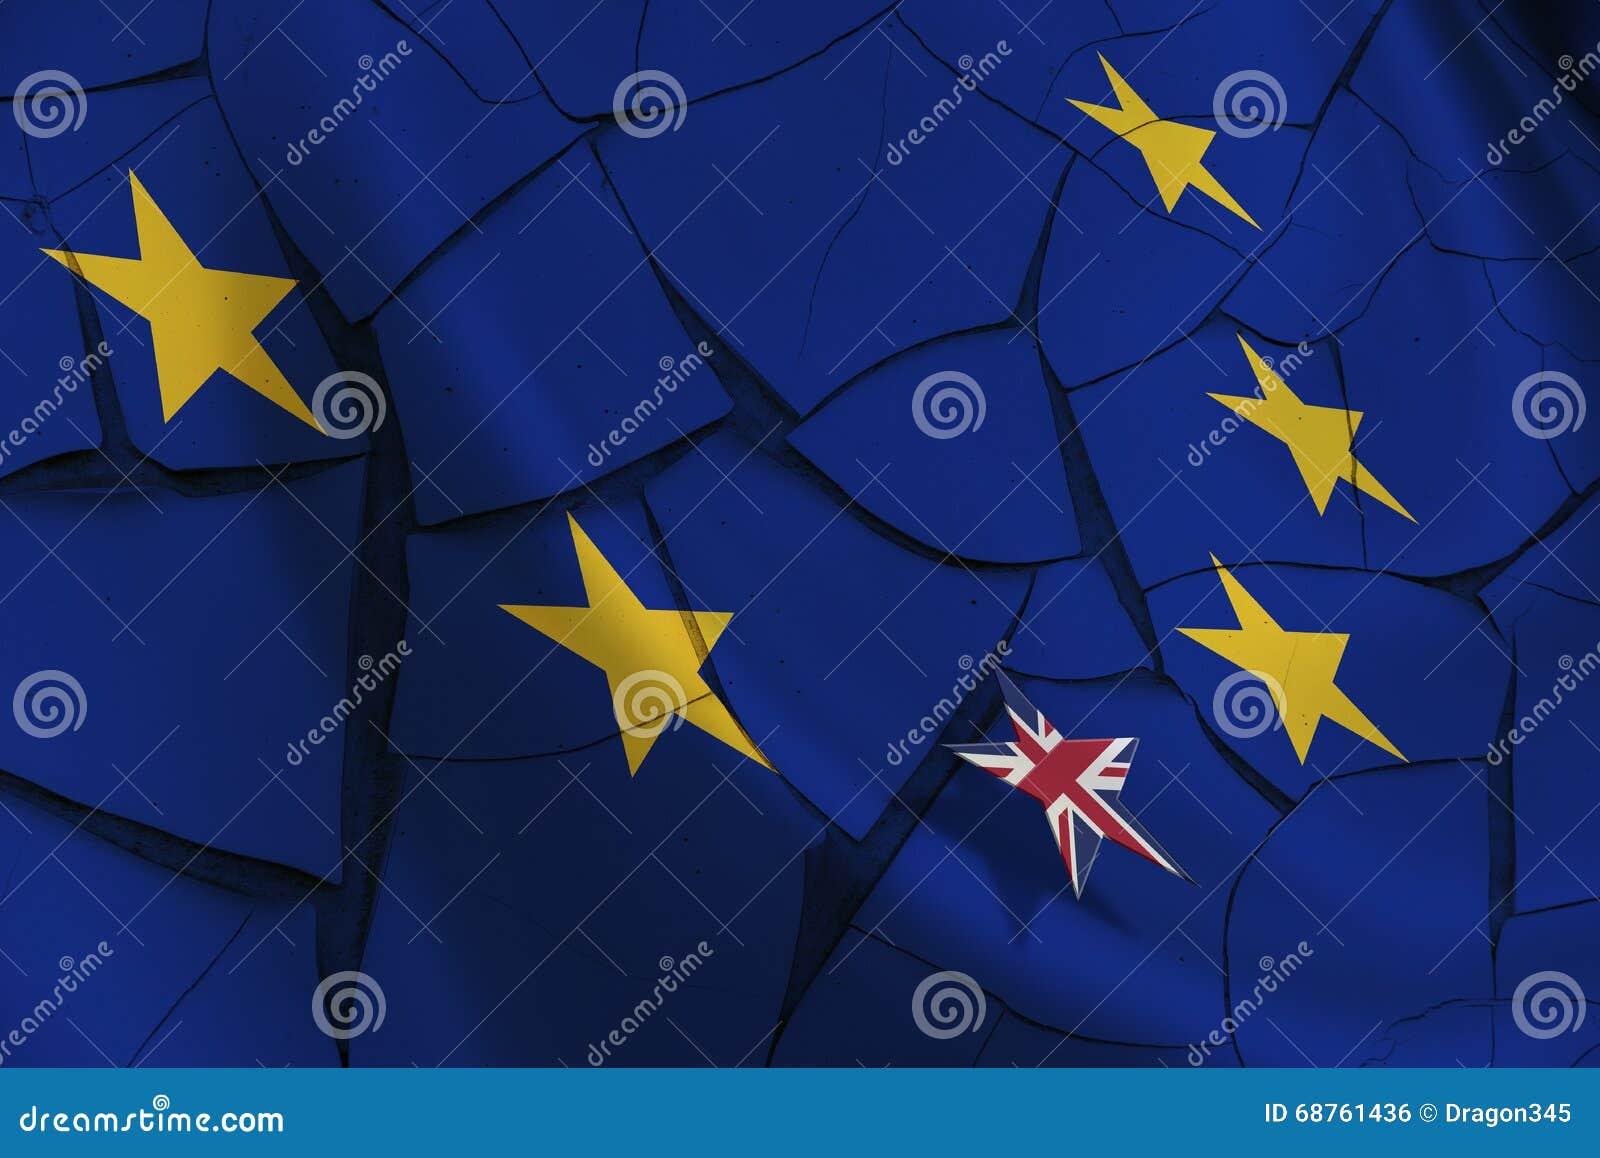 Warum Hat Die Eu Flagge 12 Sterne